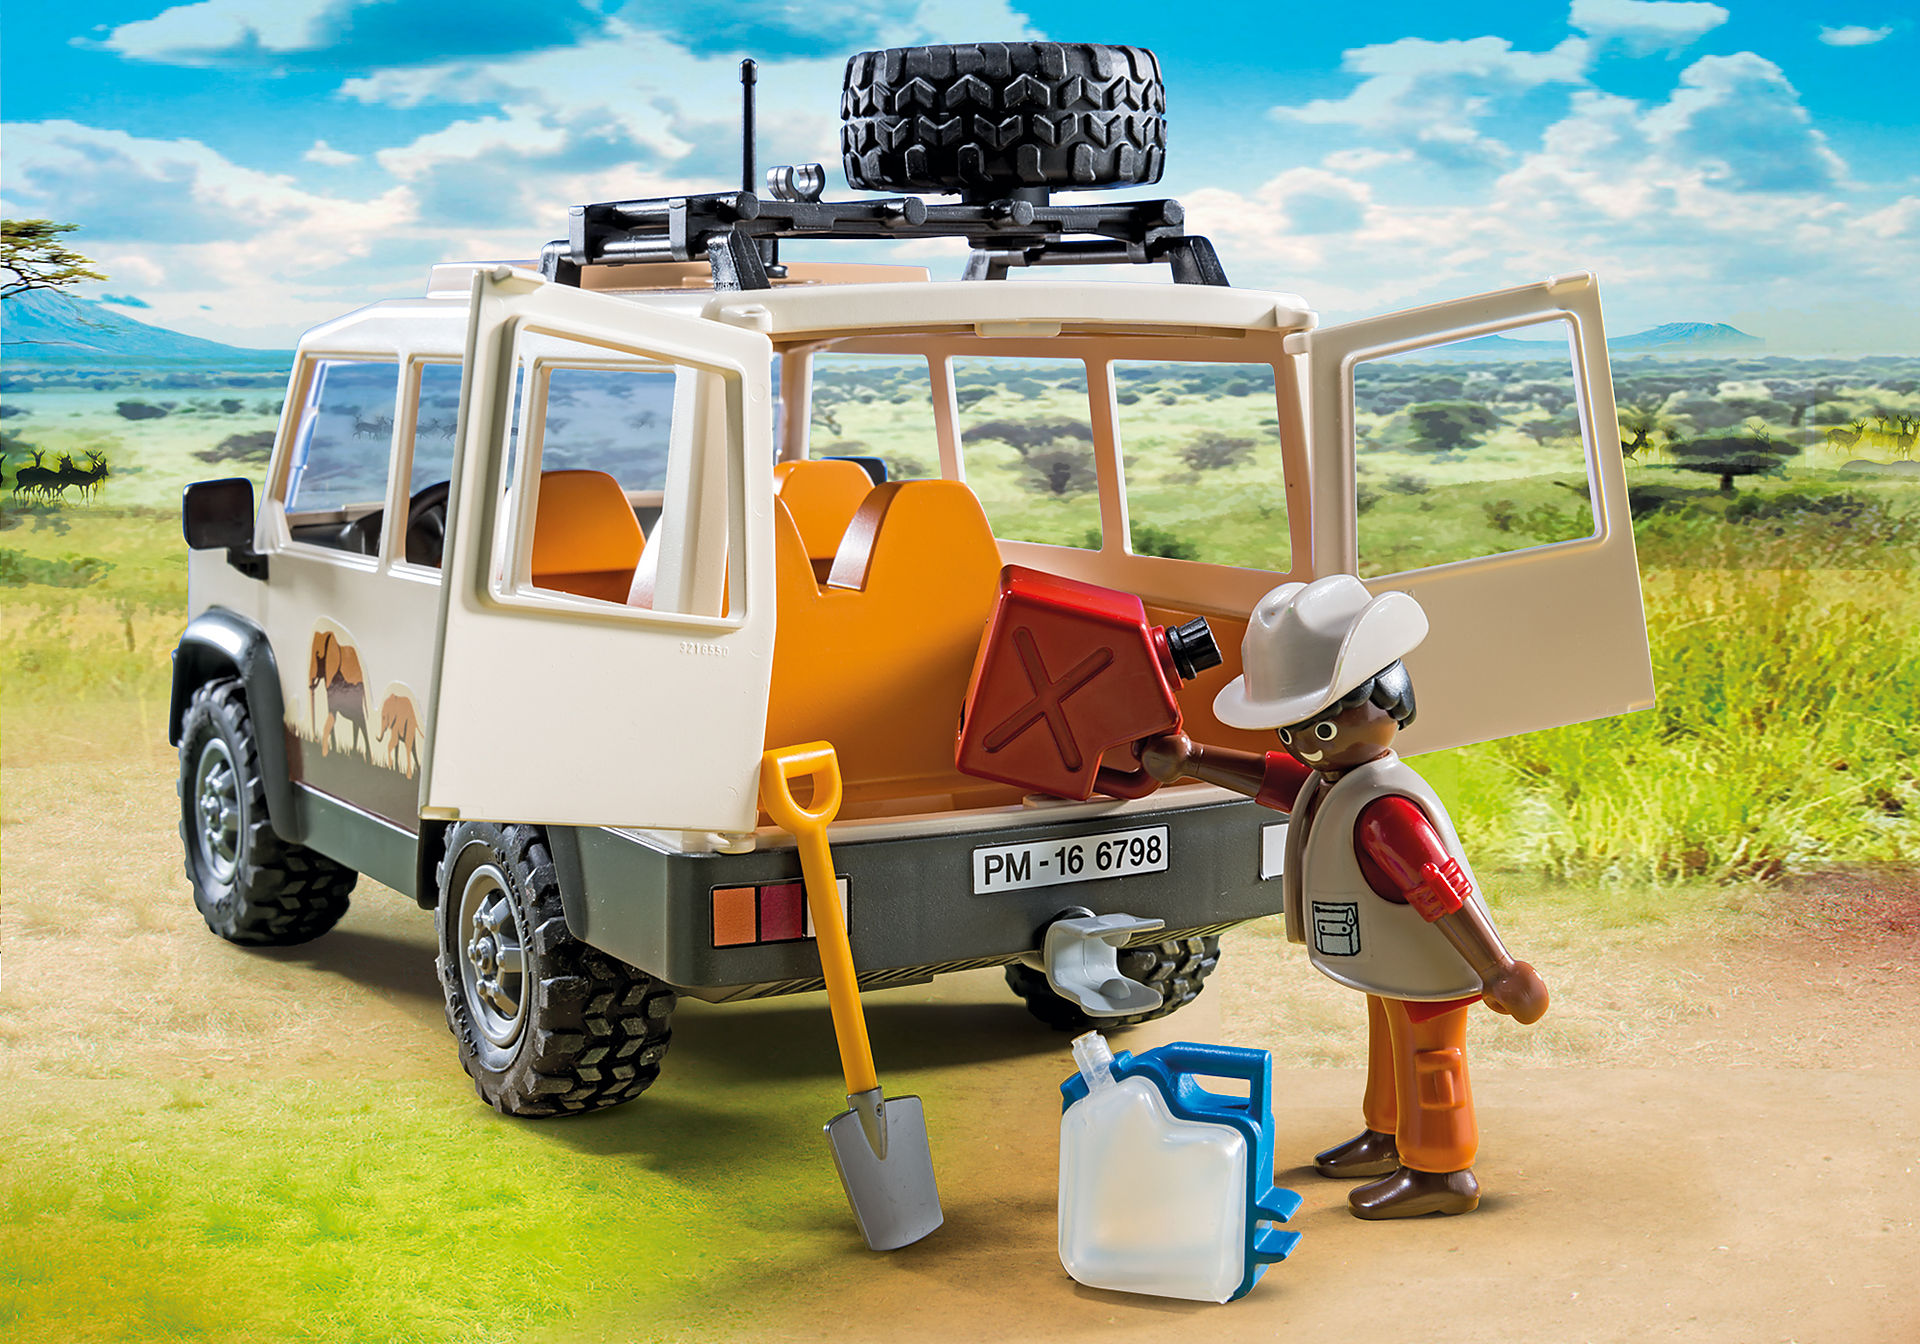 http://media.playmobil.com/i/playmobil/6798_product_extra2/Vehículo Safari con Leones